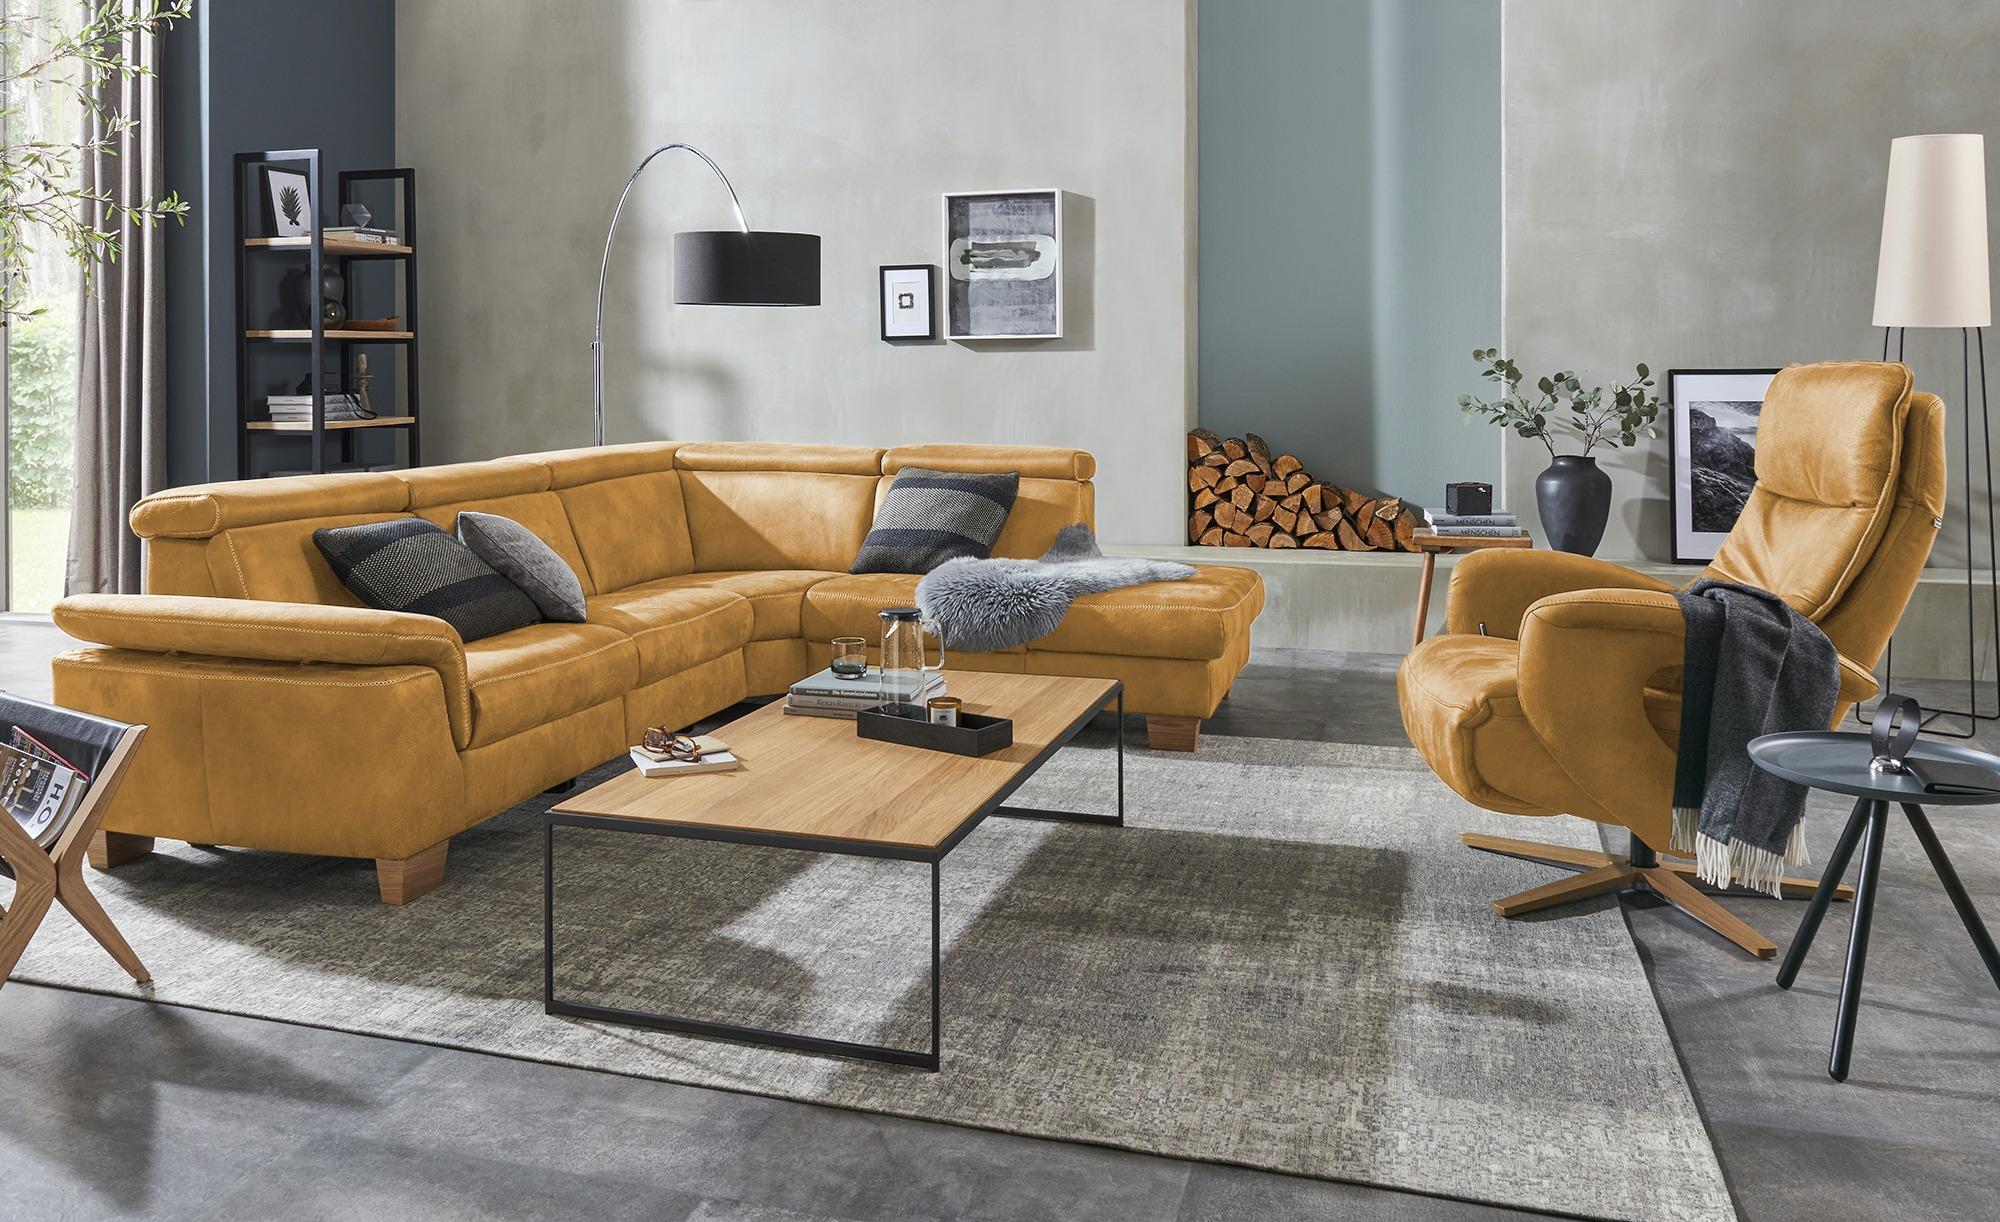 Relaxsessel  Edvin ¦ gelb ¦ Maße (cm): B: 75 H: 112 T: 87 Polstermöbel > Sessel > Ledersessel - Höffner